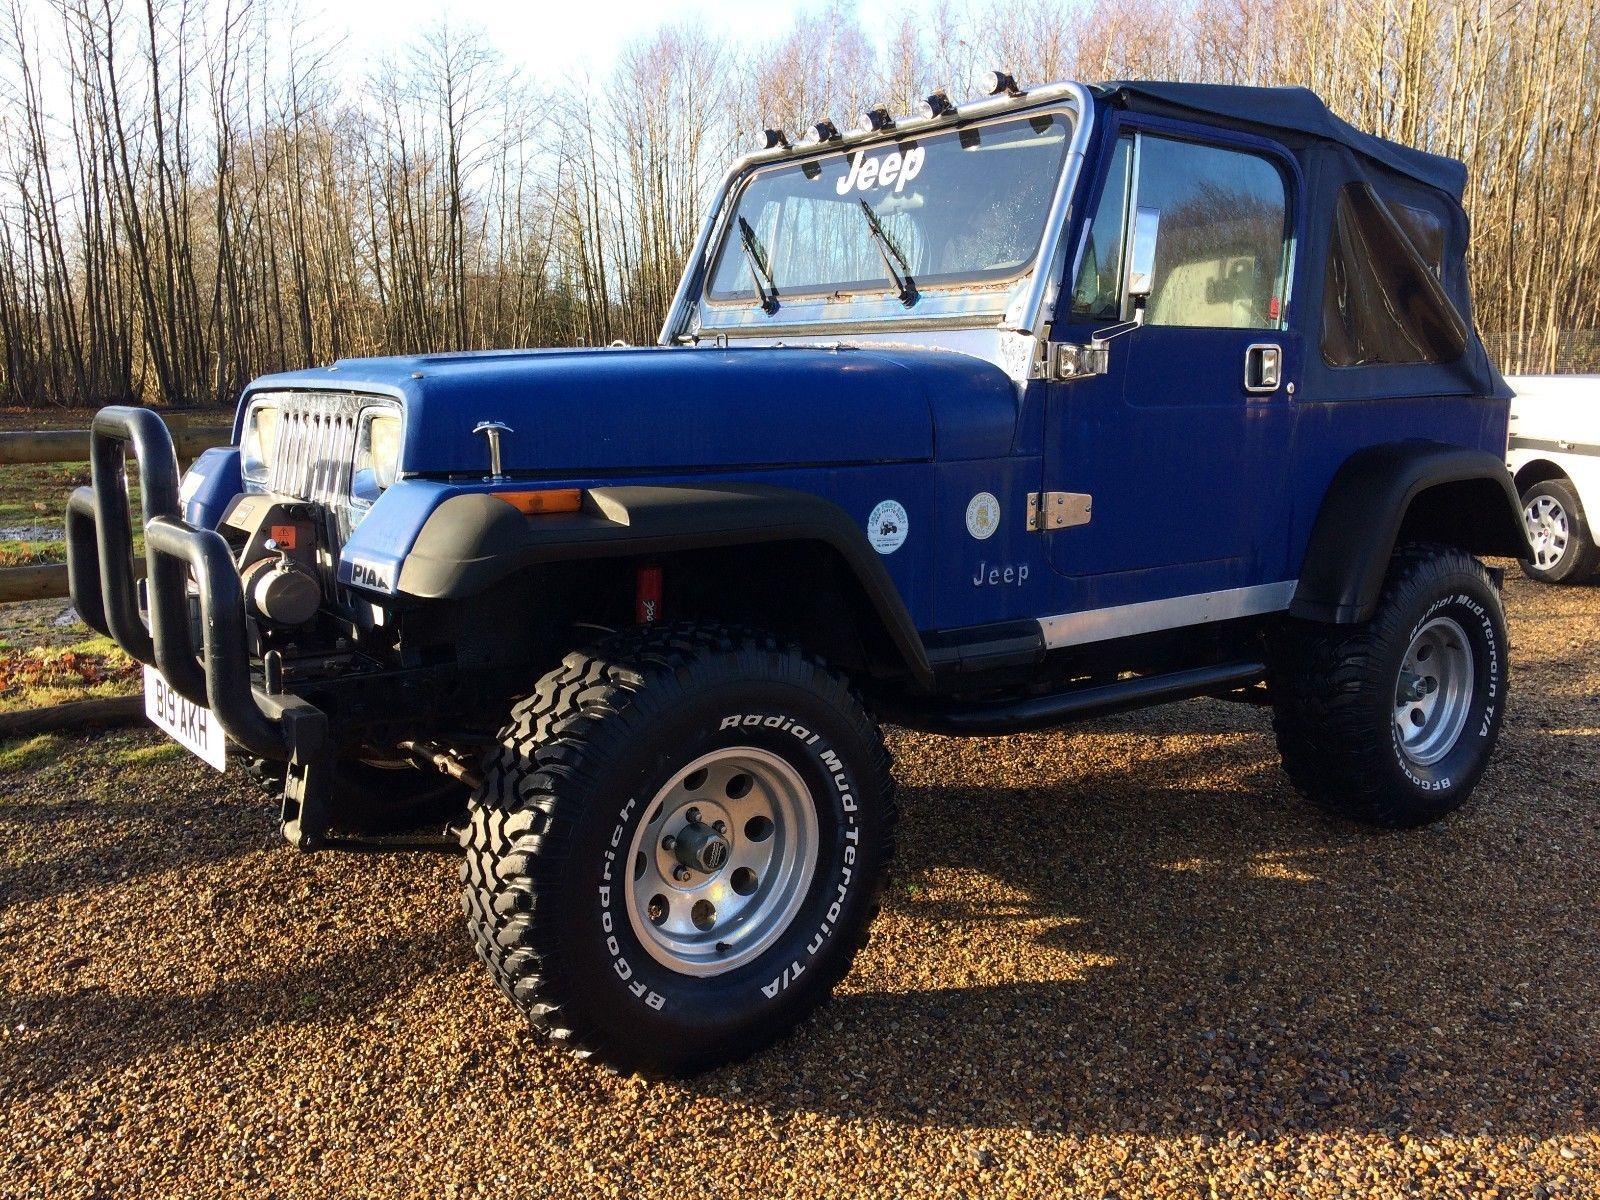 Ebay 1985 Jeep Wrangler Soft Top Jeep Jeeplife Jeep Wrangler